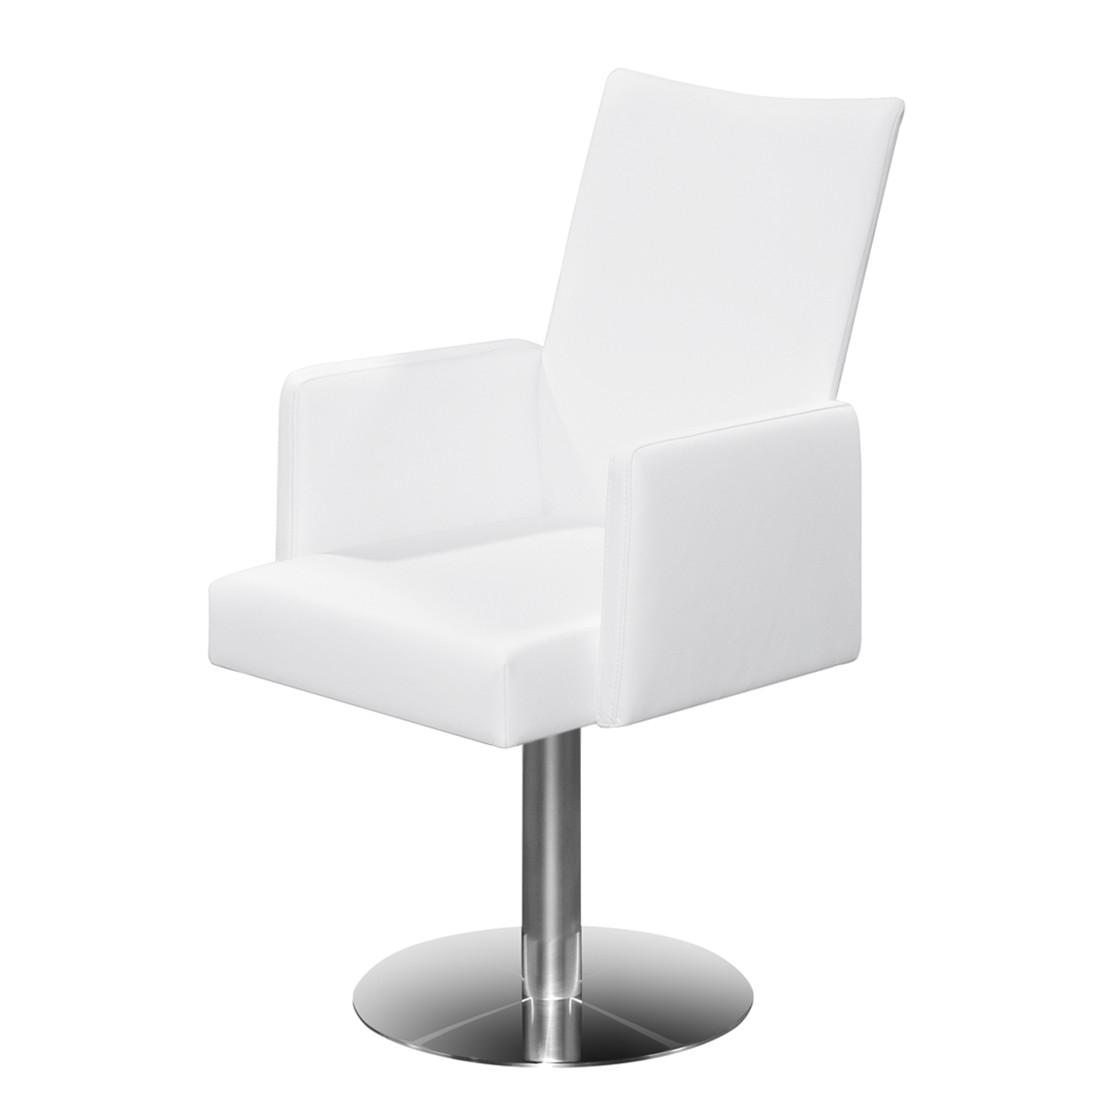 Drehstuhl Set I   Kunstleder Weiß, Arte Mu20ac 399,99Anbieter:  Home24.atVersand: Kostenlos